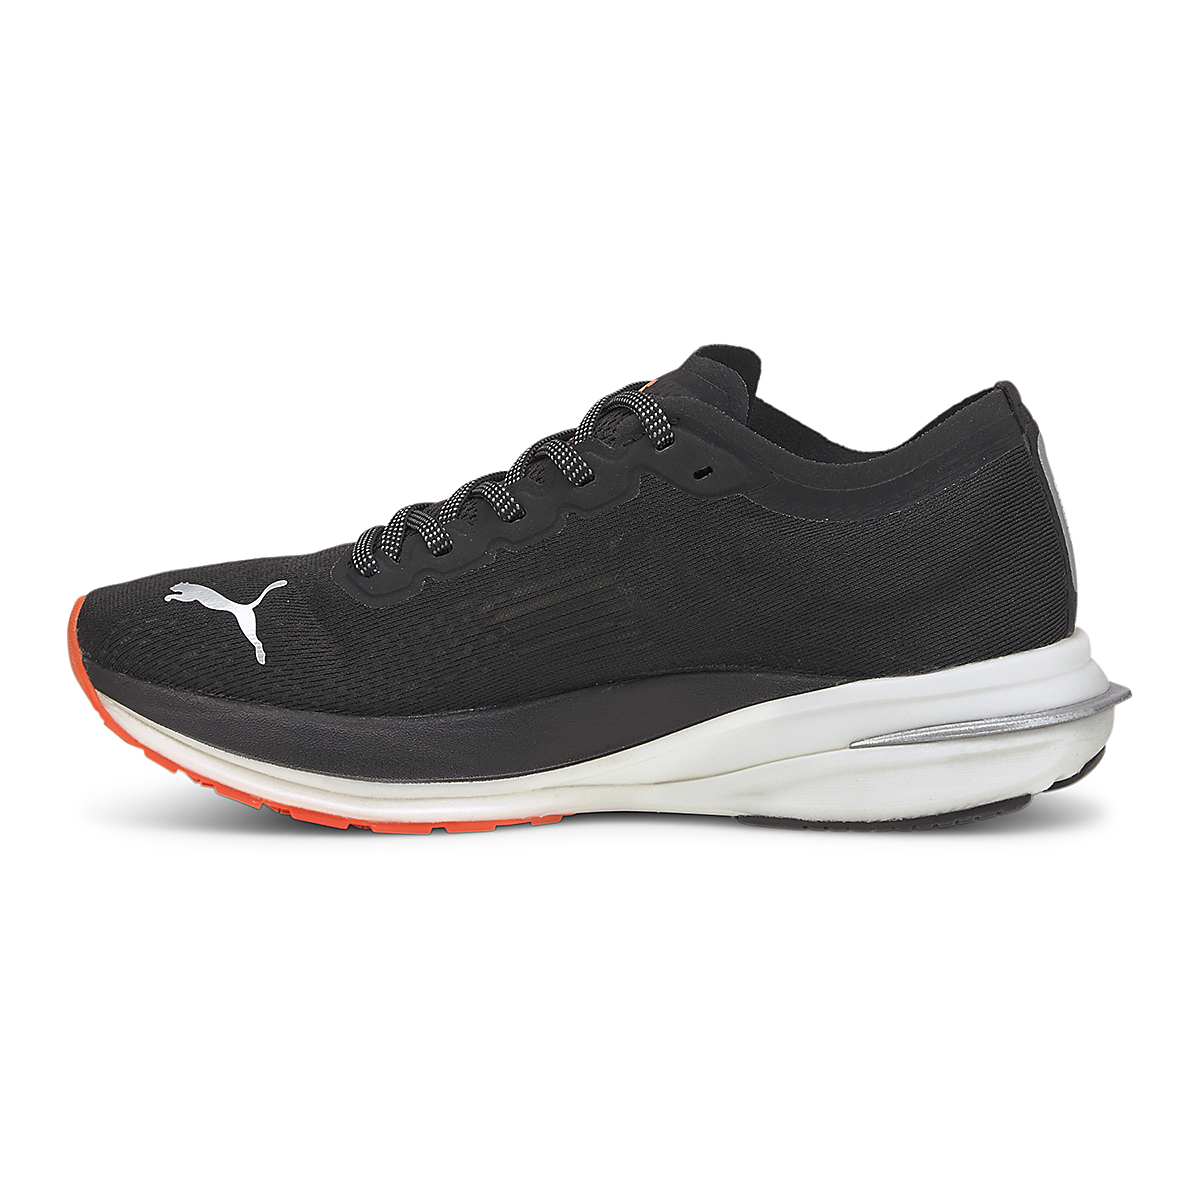 Women's Puma Deviate Nitro Running Shoe - Color: Puma Black-Lava Blast - Size: 5.5 - Width: Regular, Puma Black-Lava Blast, large, image 2